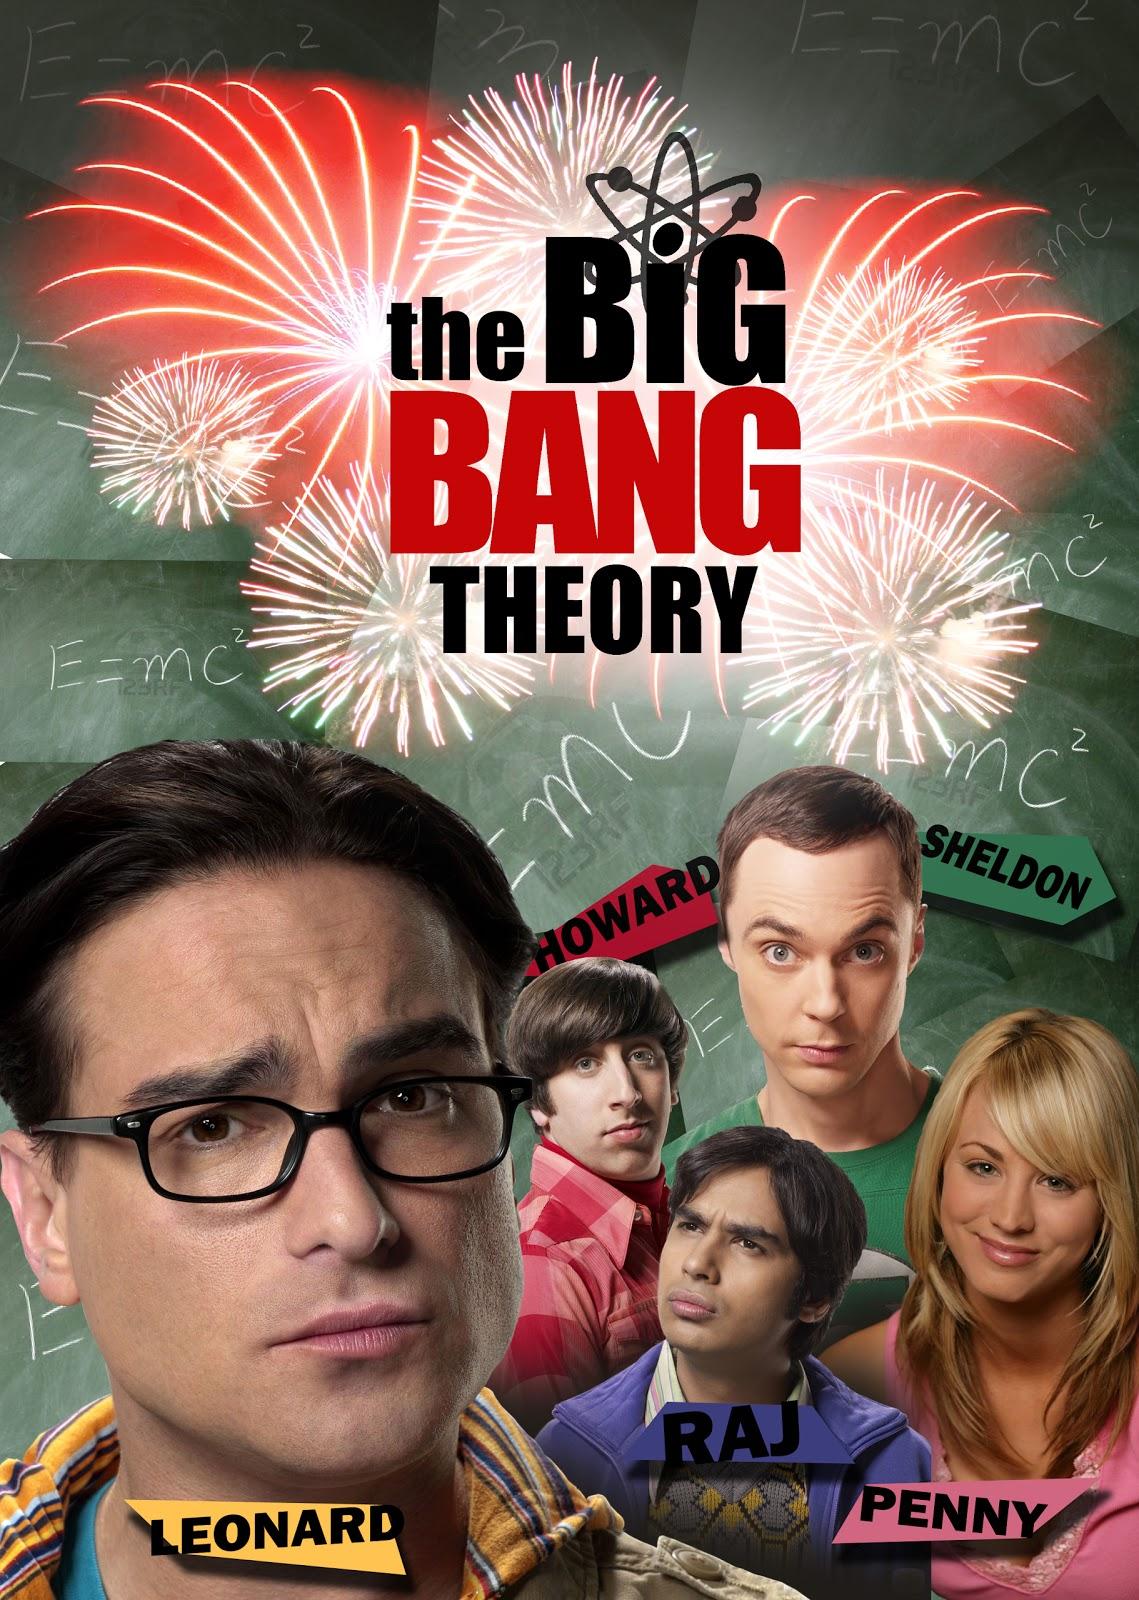 The Big Theory